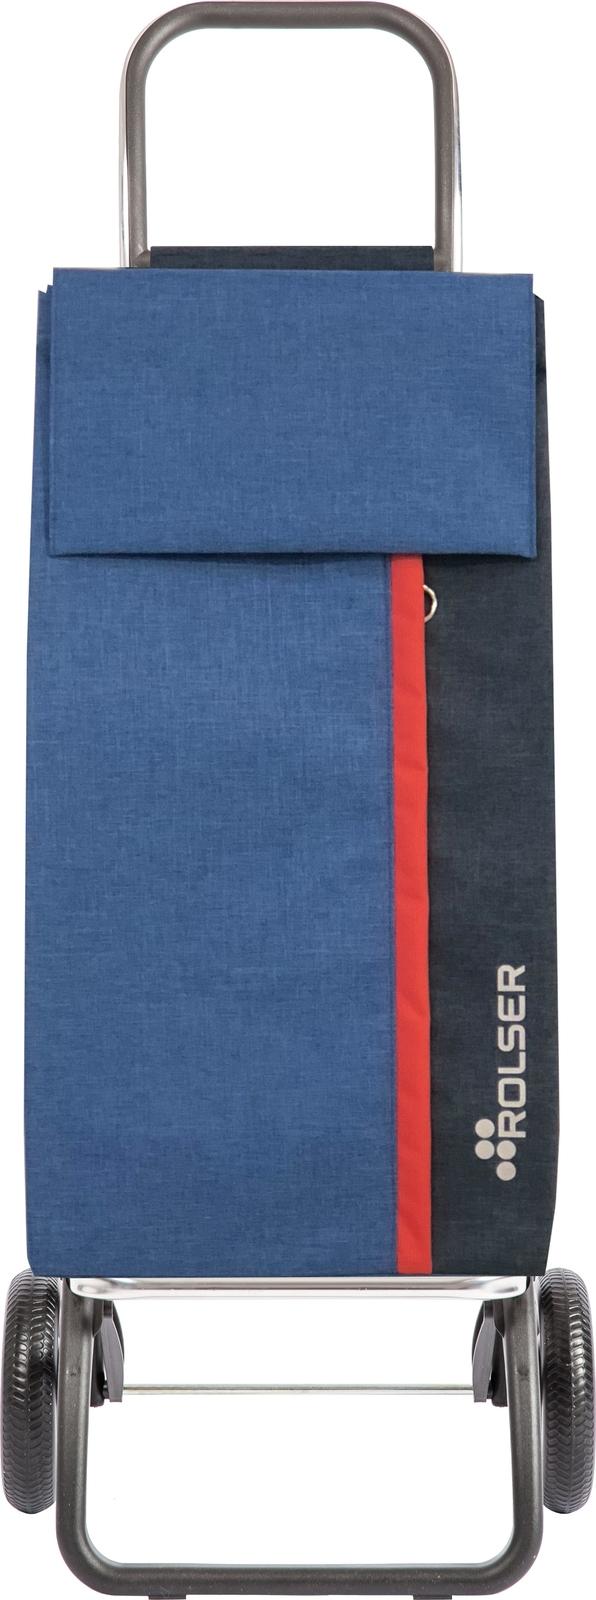 Сумка-тележка Rolser Convert RG, цвет: синий, 40 л. KAN001 сумка тележка rolser logic rg цвет синий 41 л pep004